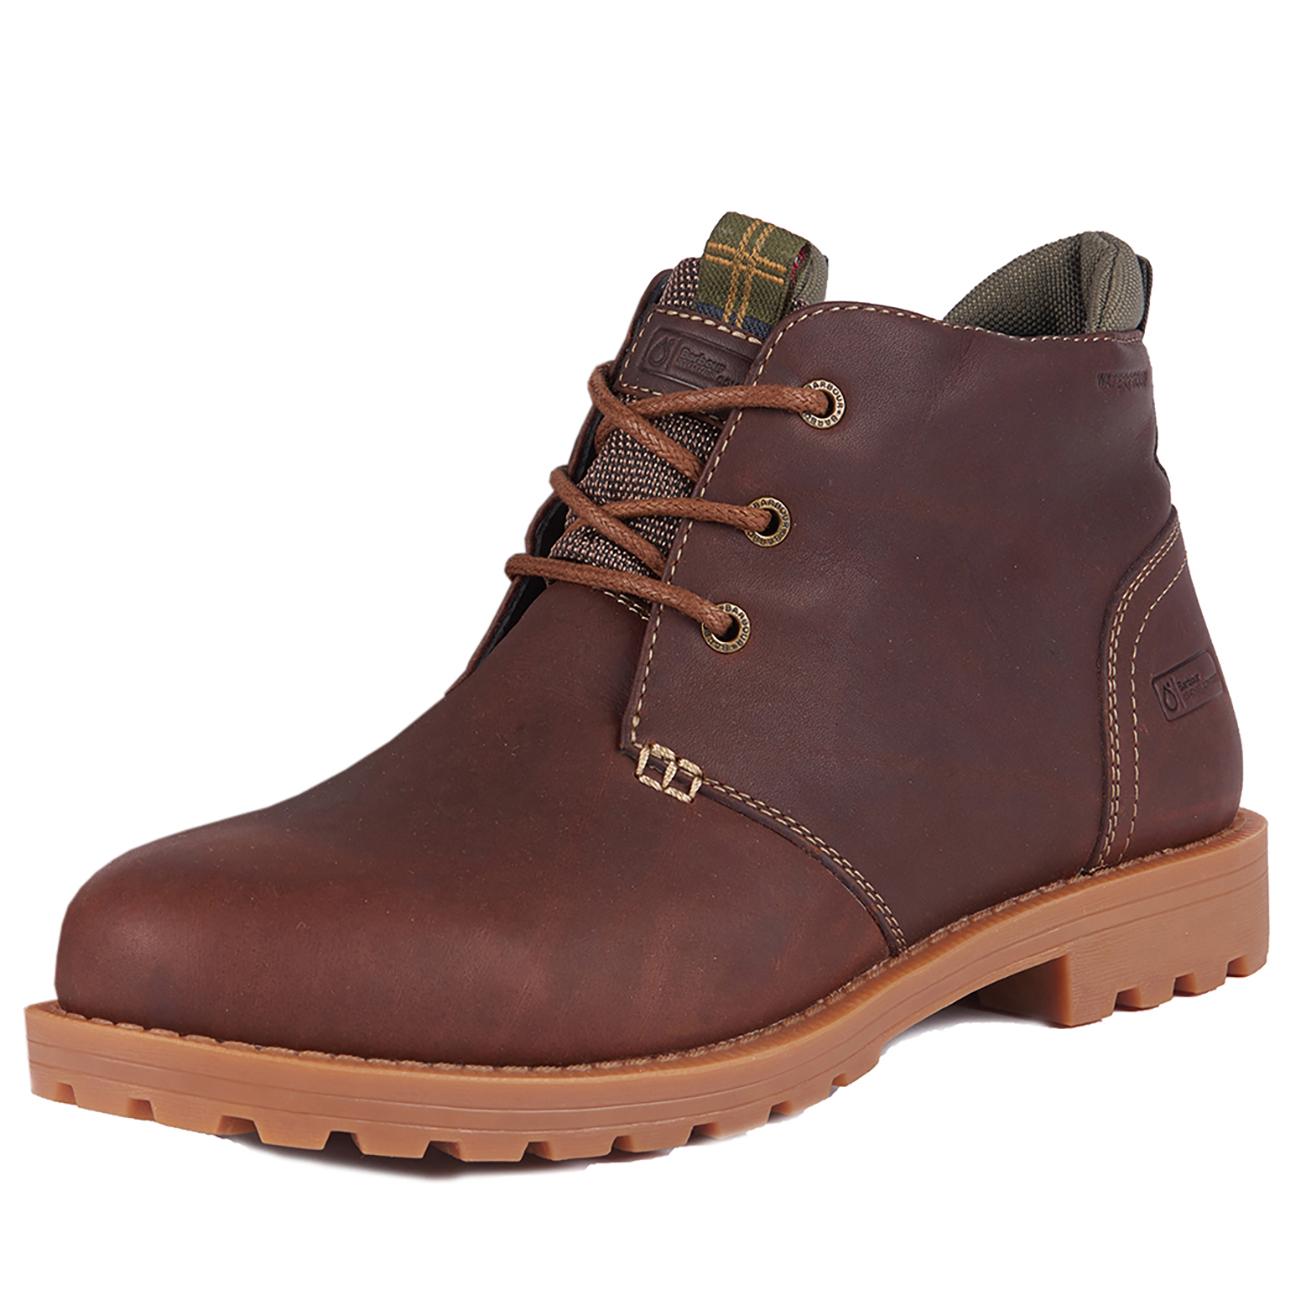 Barbour Pennine Chukka Boot